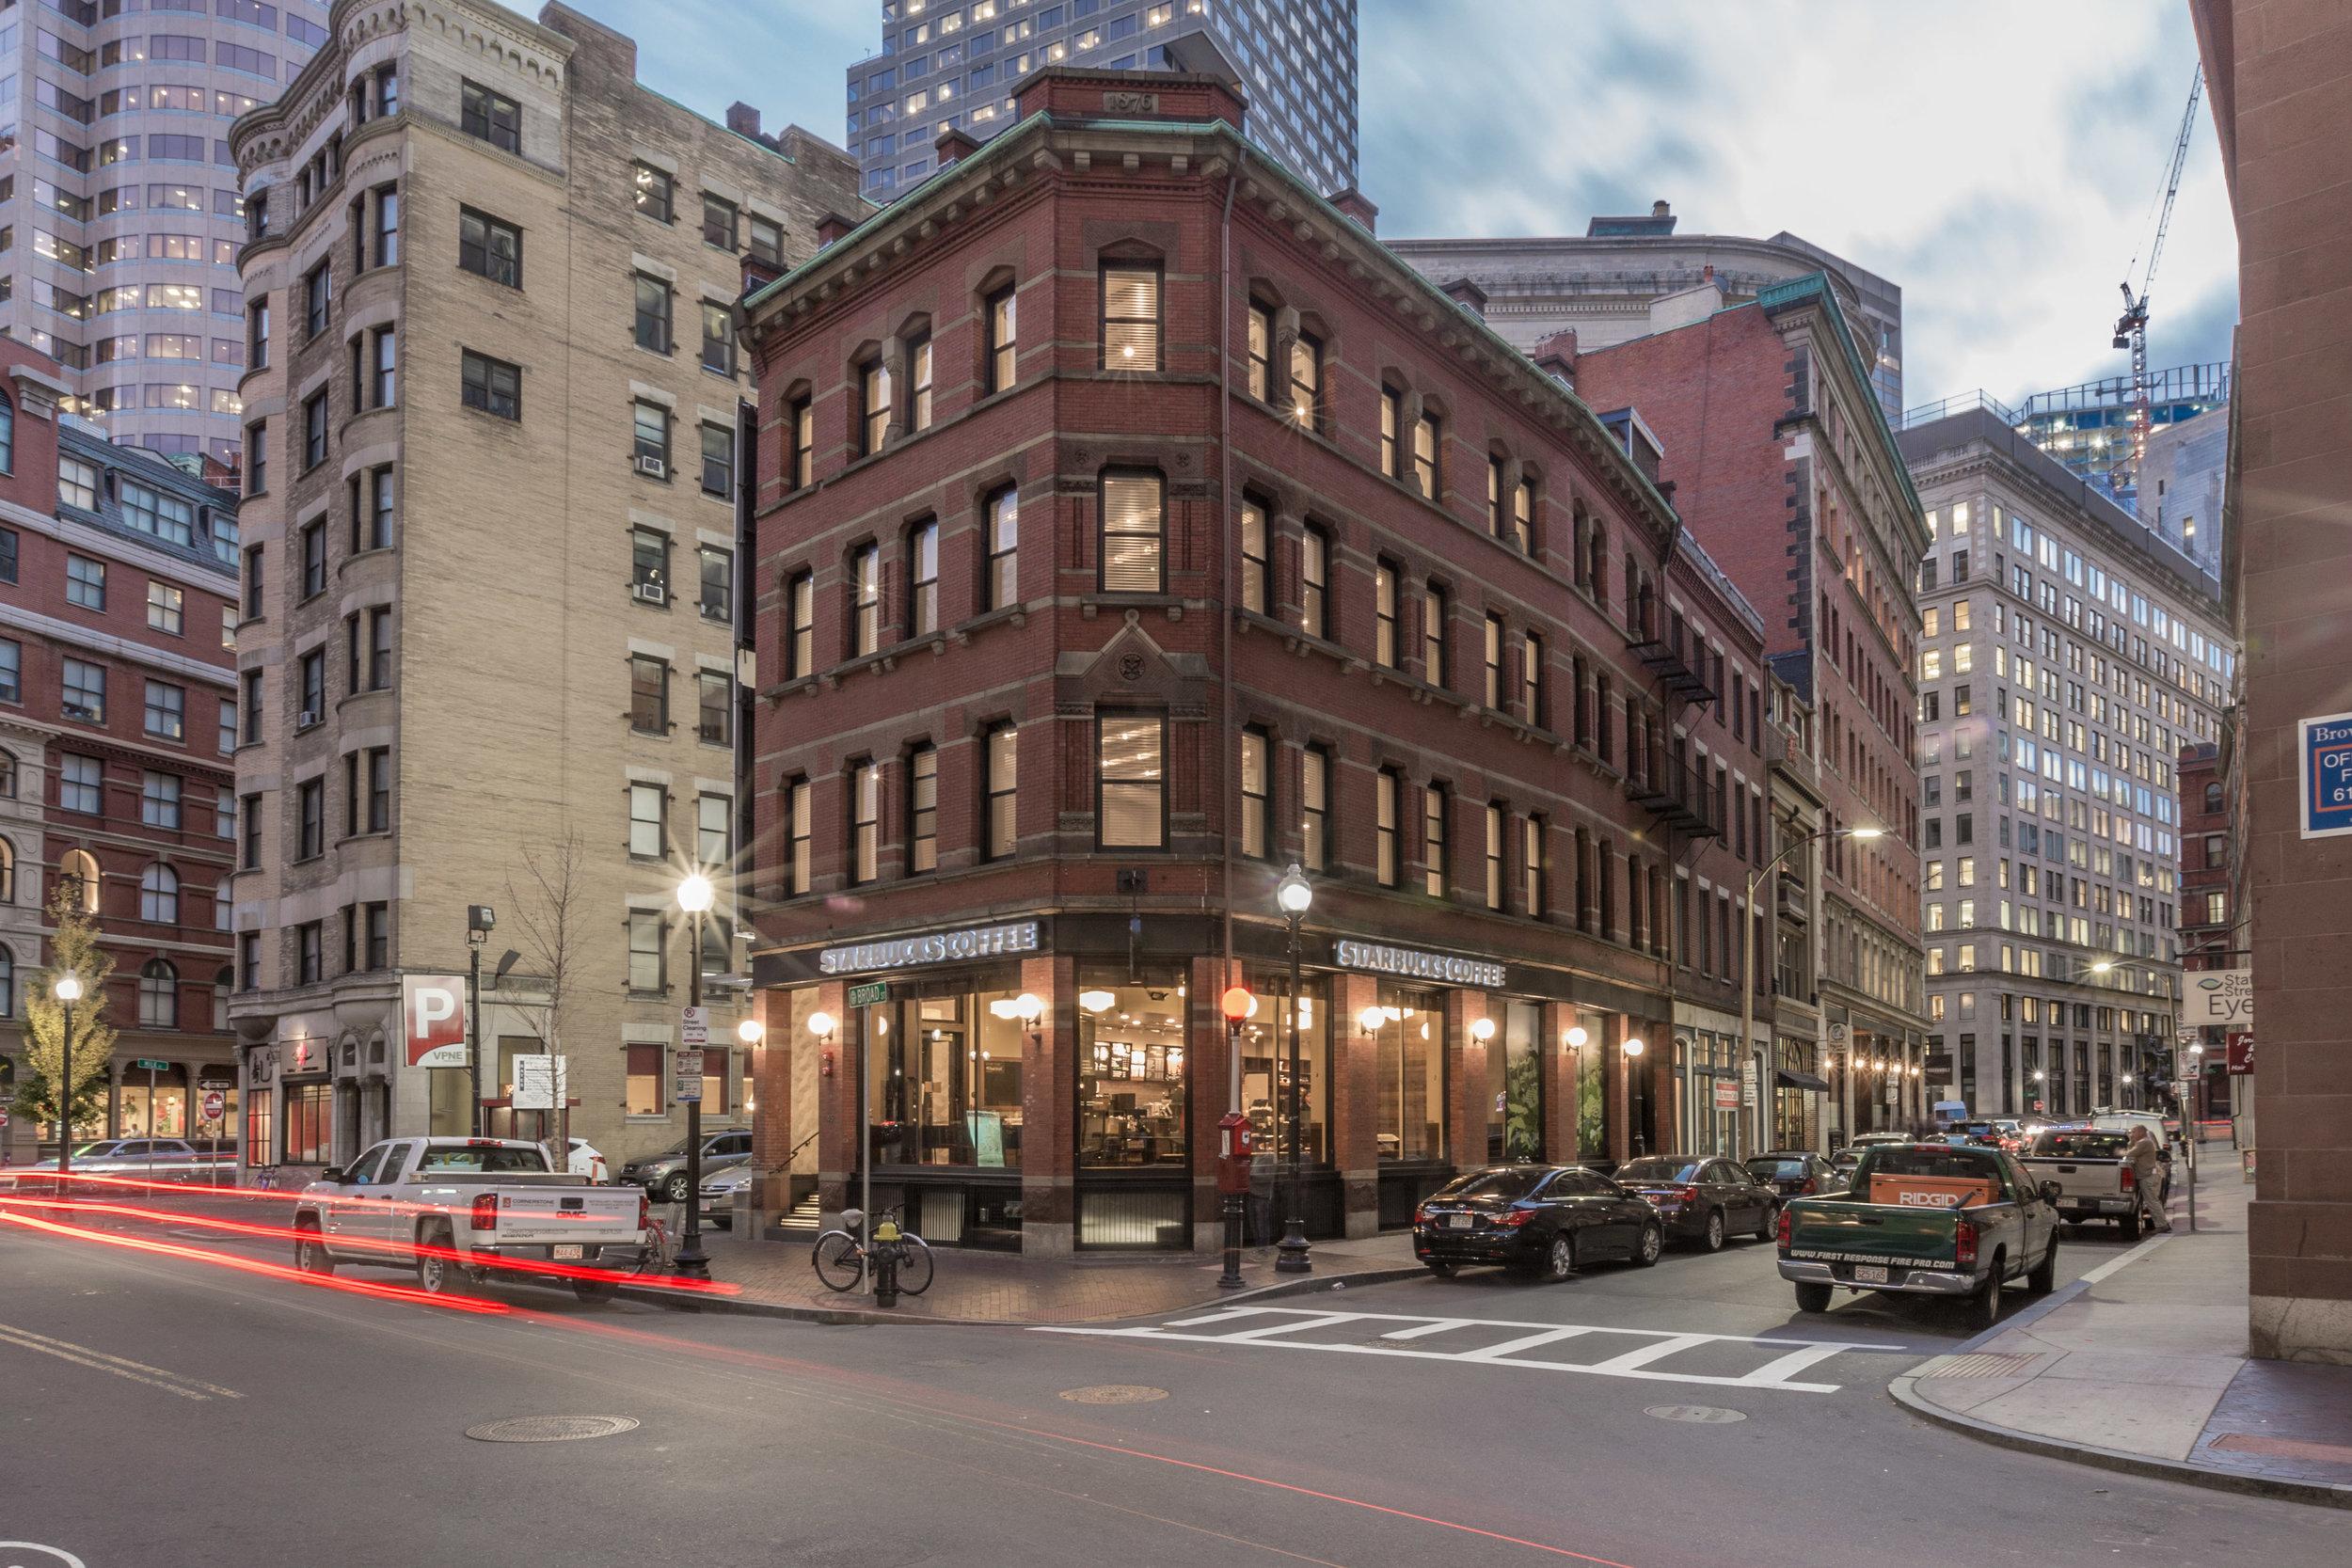 Broad Street Exterior (1 of 1).jpg